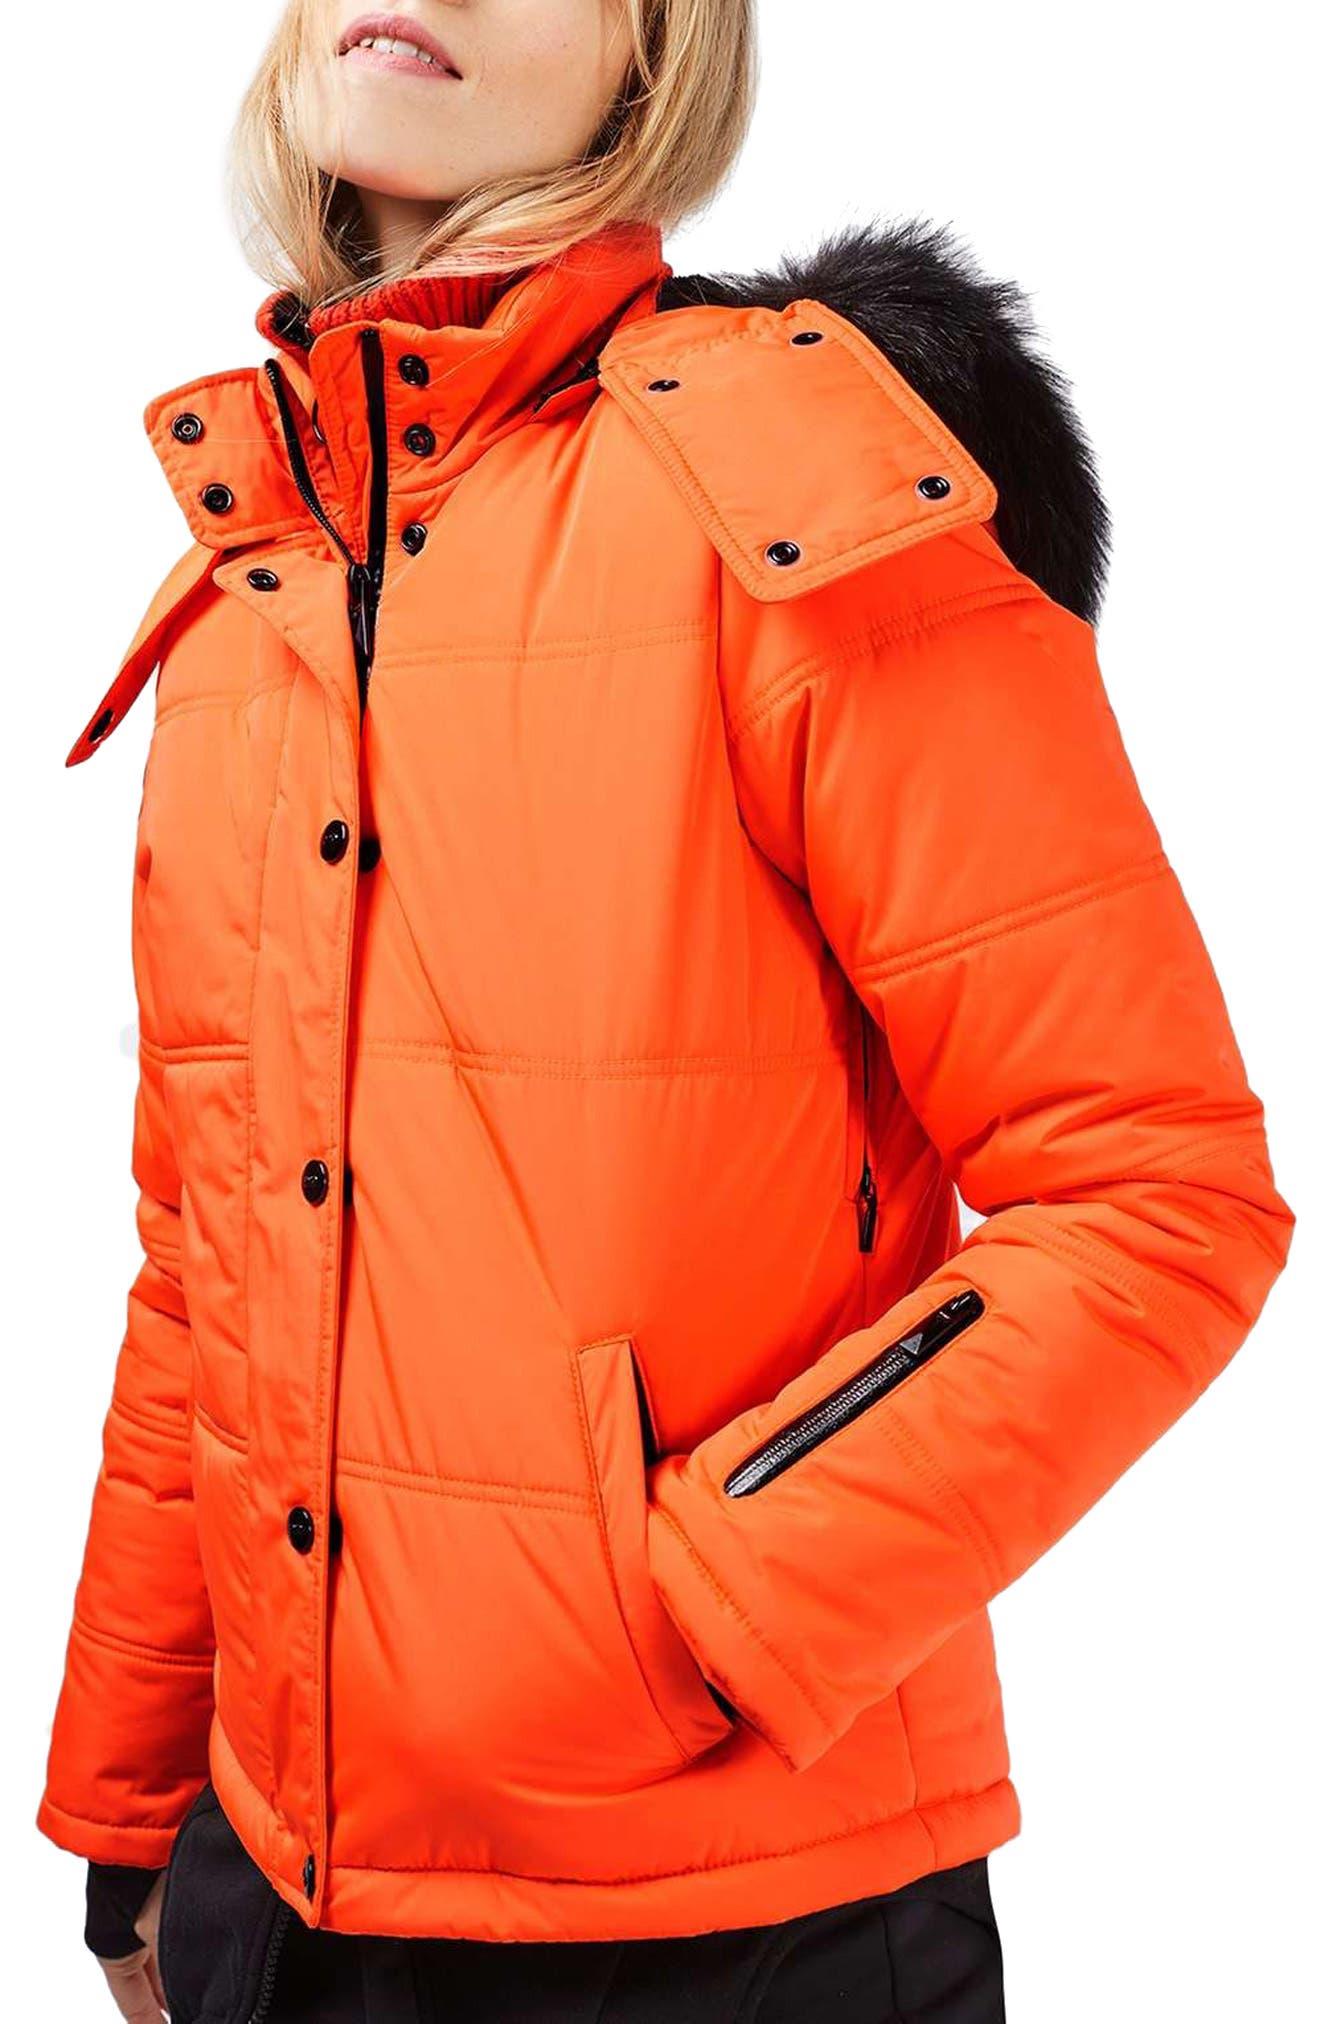 Alternate Image 1 Selected - Topshop Hero Puffer Ski Jacket